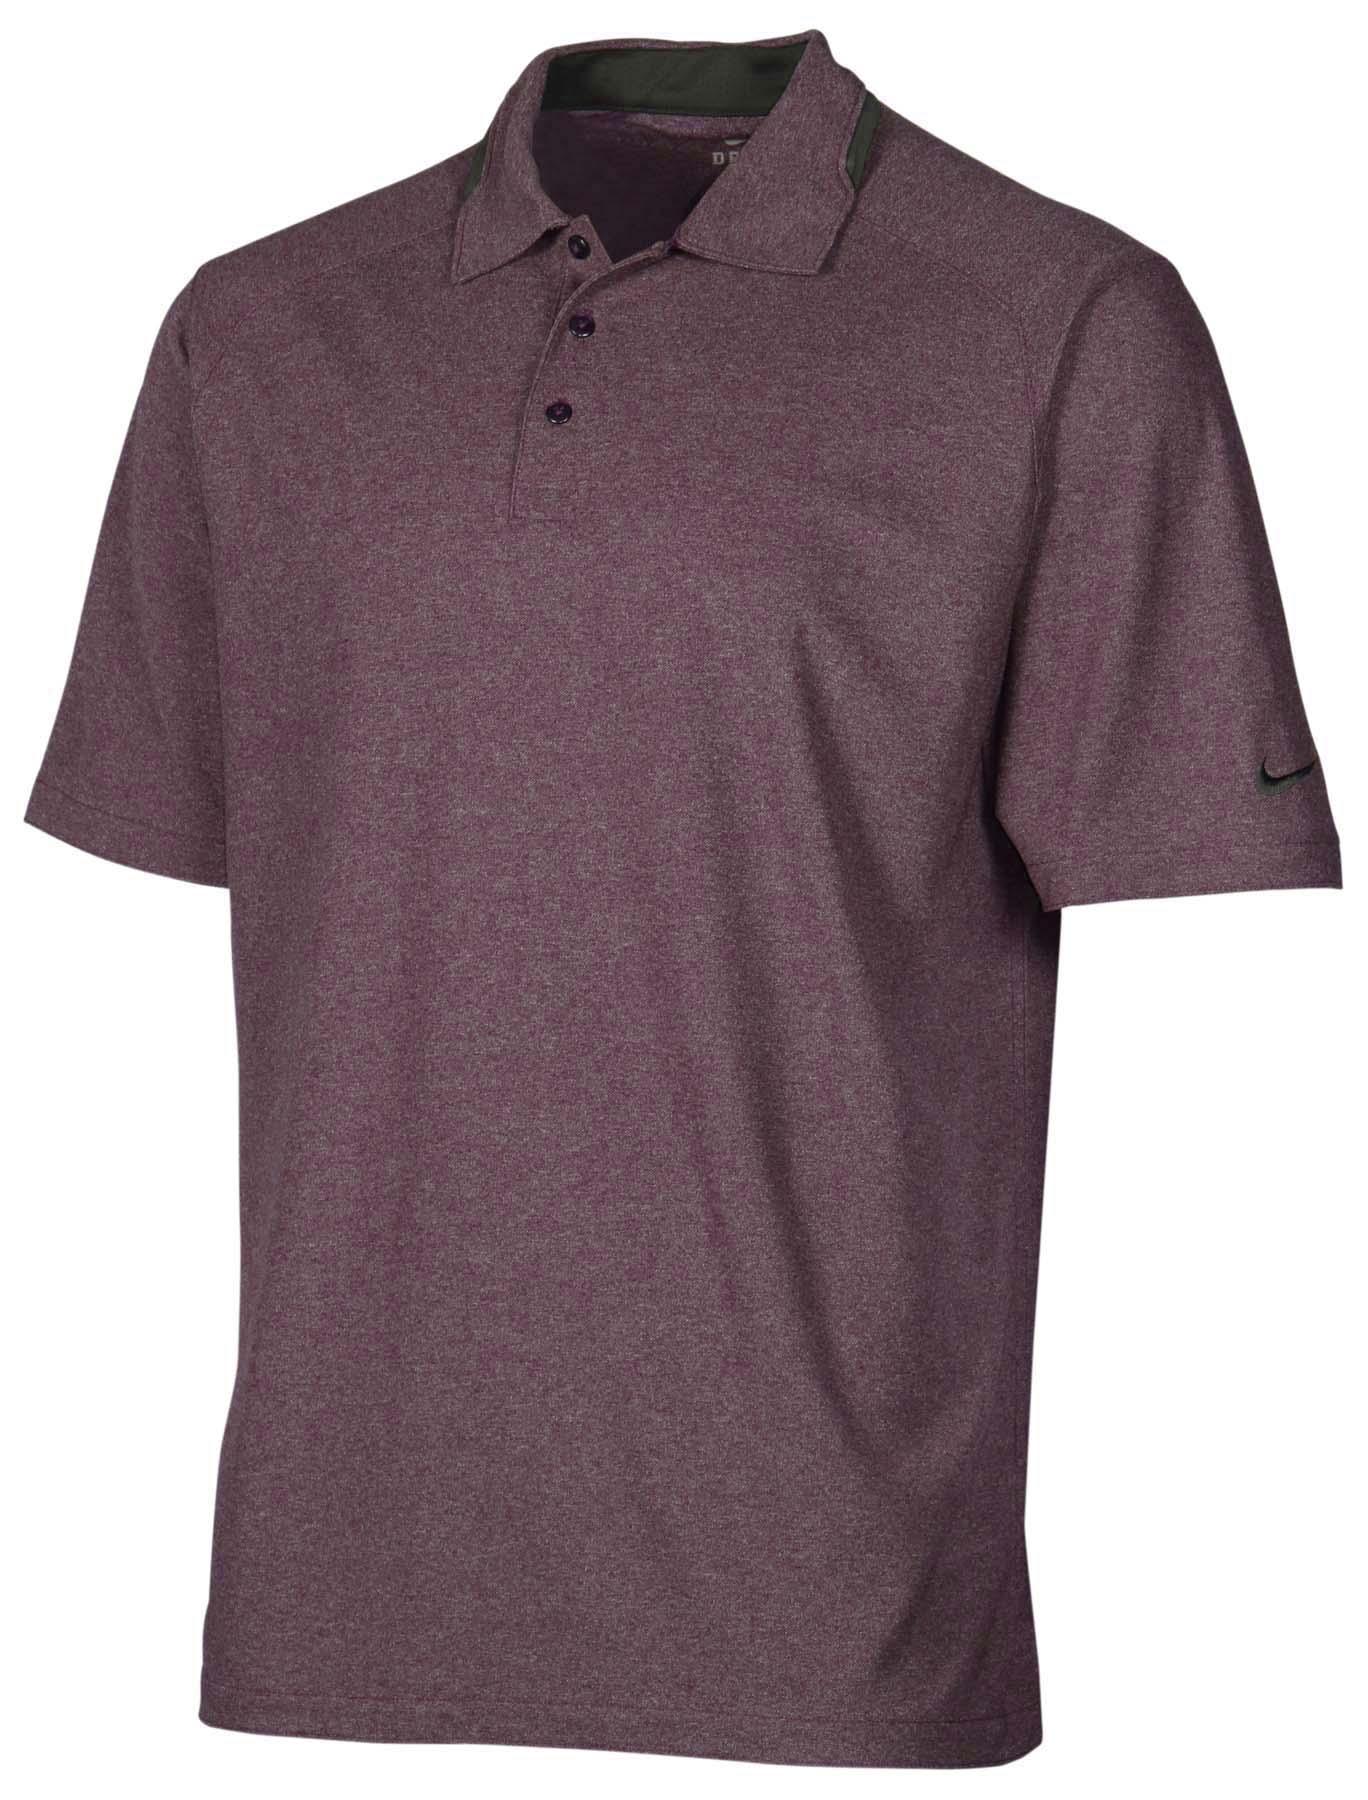 Nike men 39 s dri fit on field coaches football polo shirt ebay for Soccer coach polo shirt